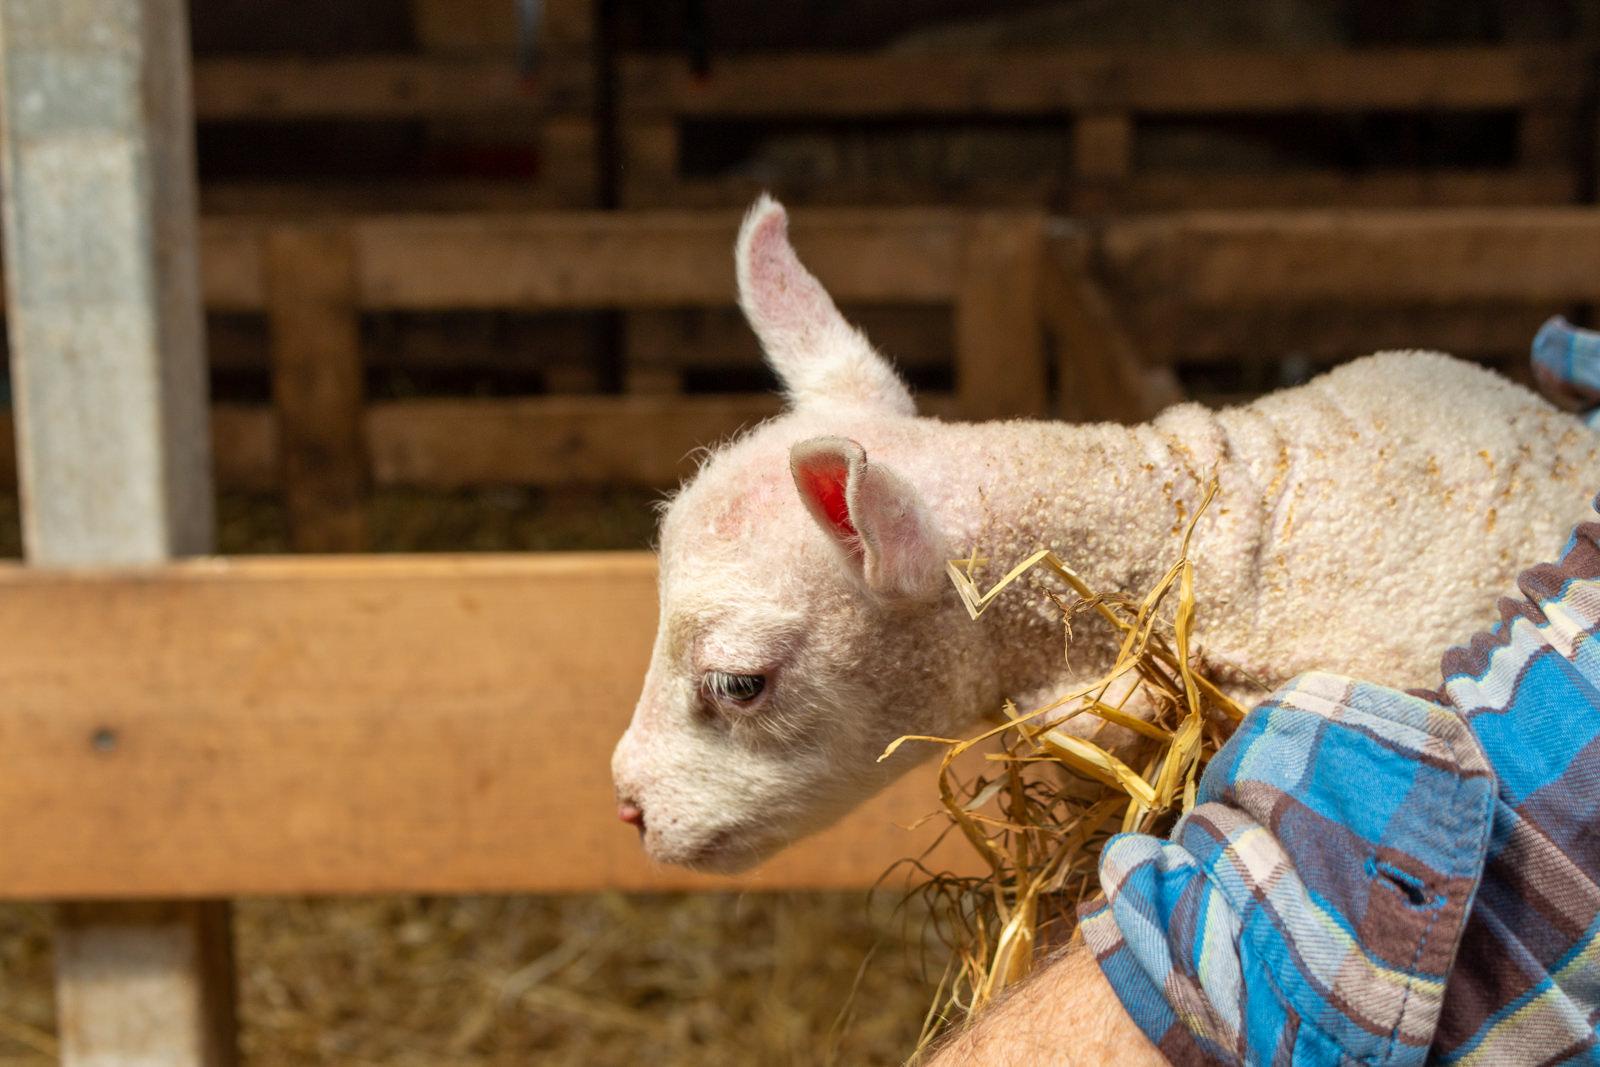 Texel, Schafe, Bauernhof, Schafsbauernhof, Schapenboerderij